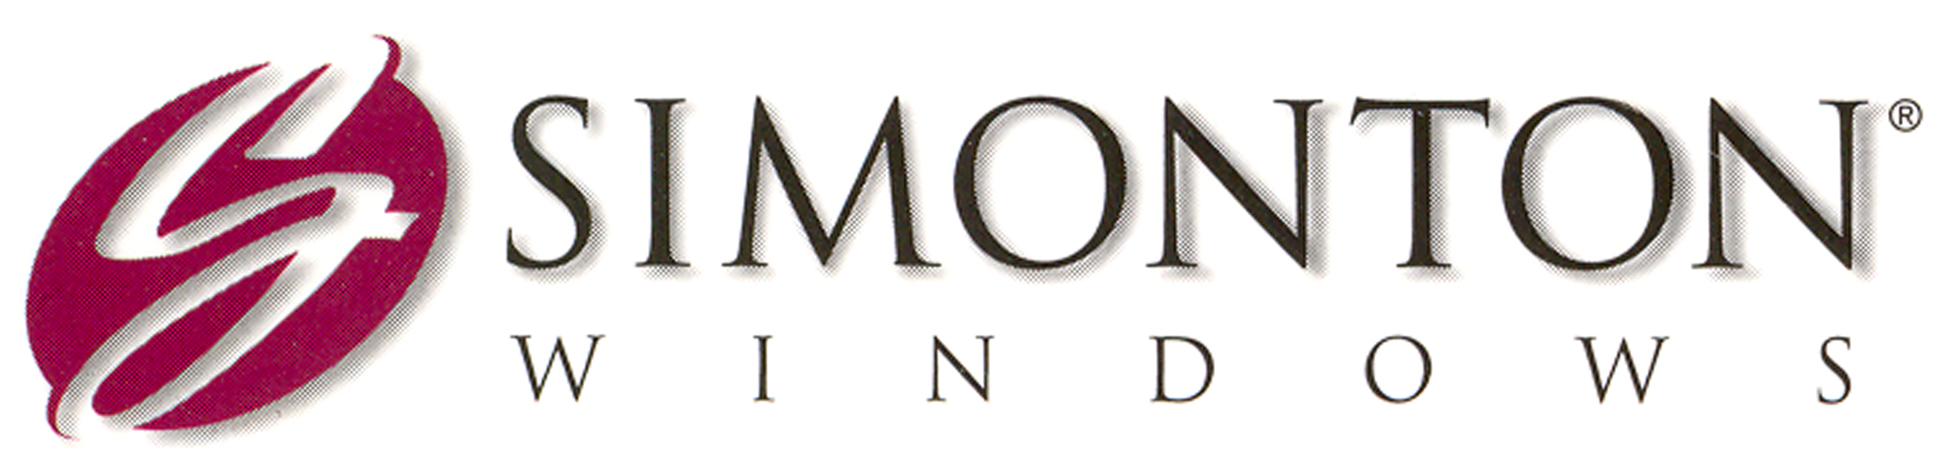 http://crystalexteriors.com/wp-content/uploads/2015/03/Simonton.jpg